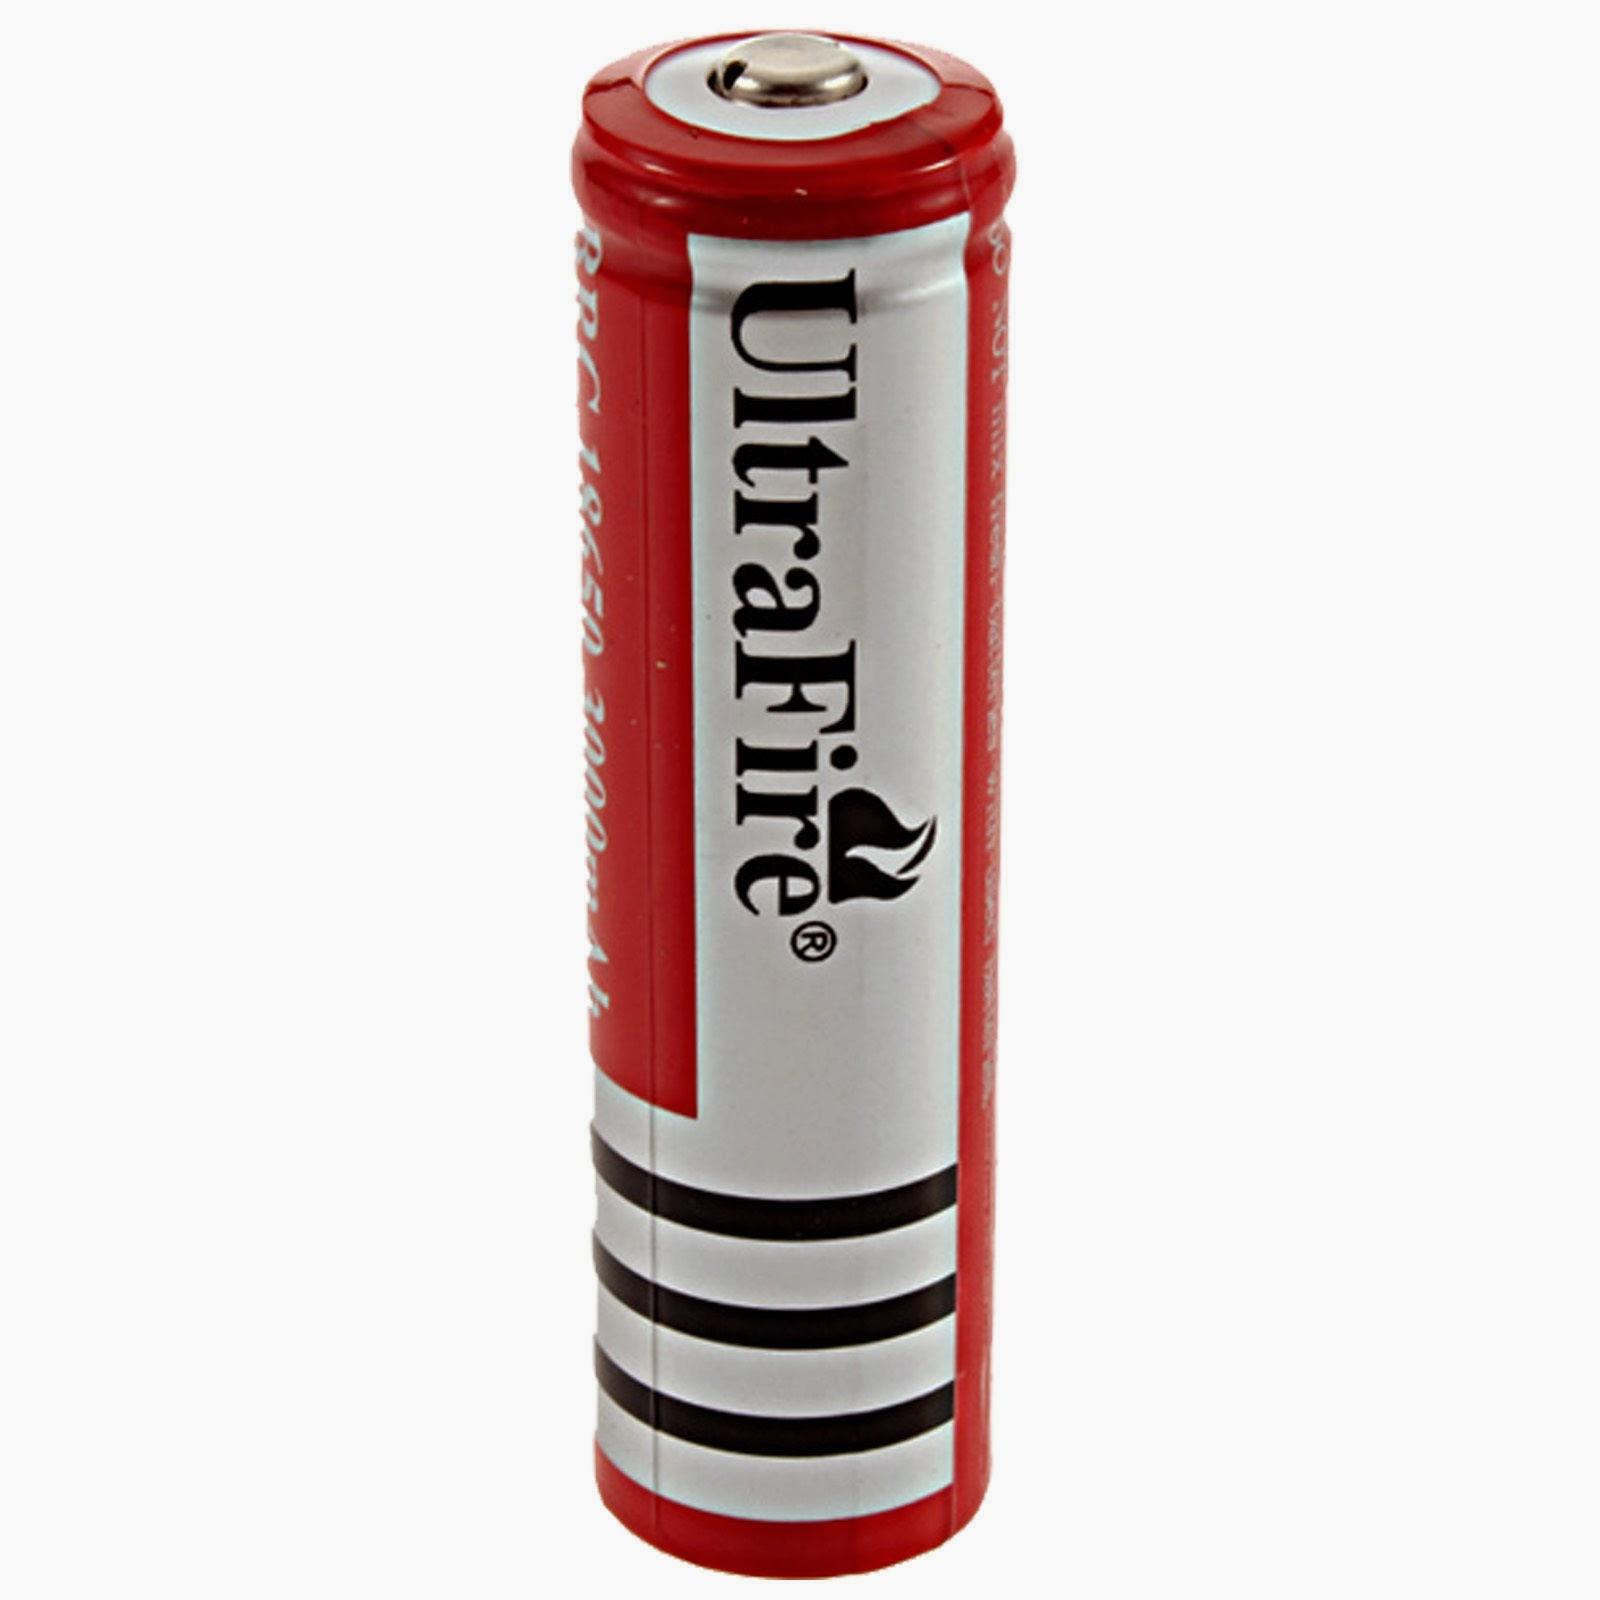 1 2 4 10 PCS 3000 3200 3800 4000 4500 5300mAh 18650 3.7V batterie UltraFire GTL